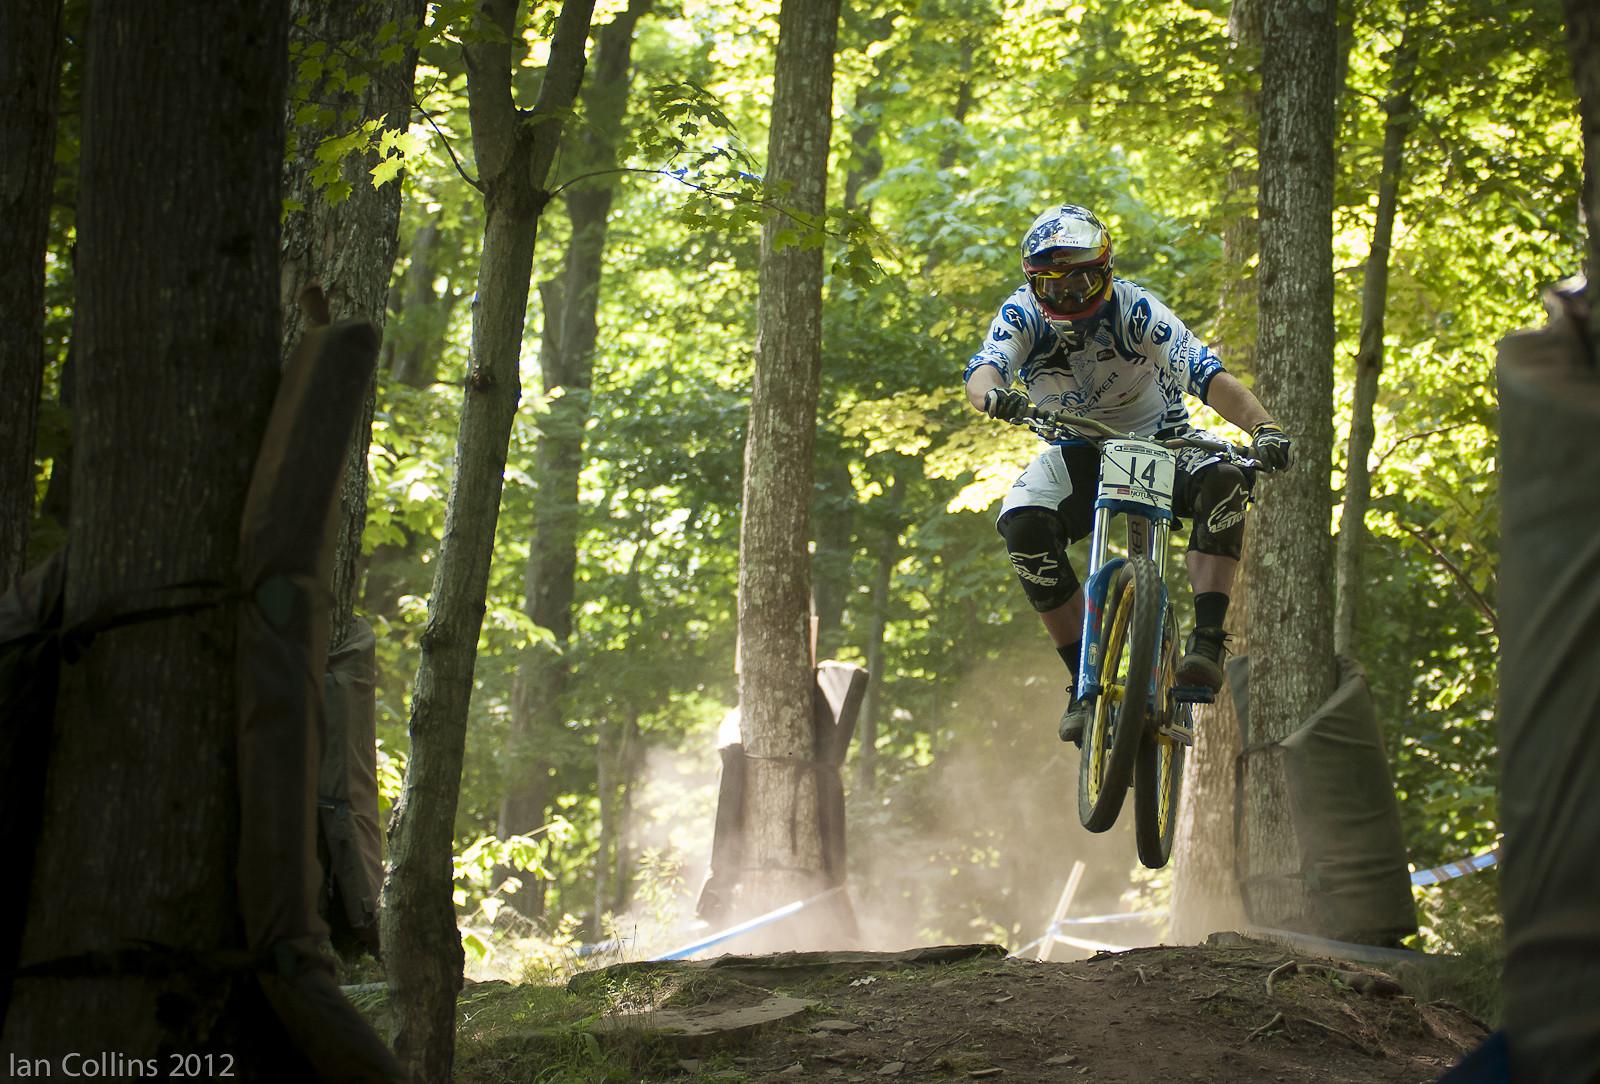 Brook MacDonald - Ian Collins - Mountain Biking Pictures - Vital MTB